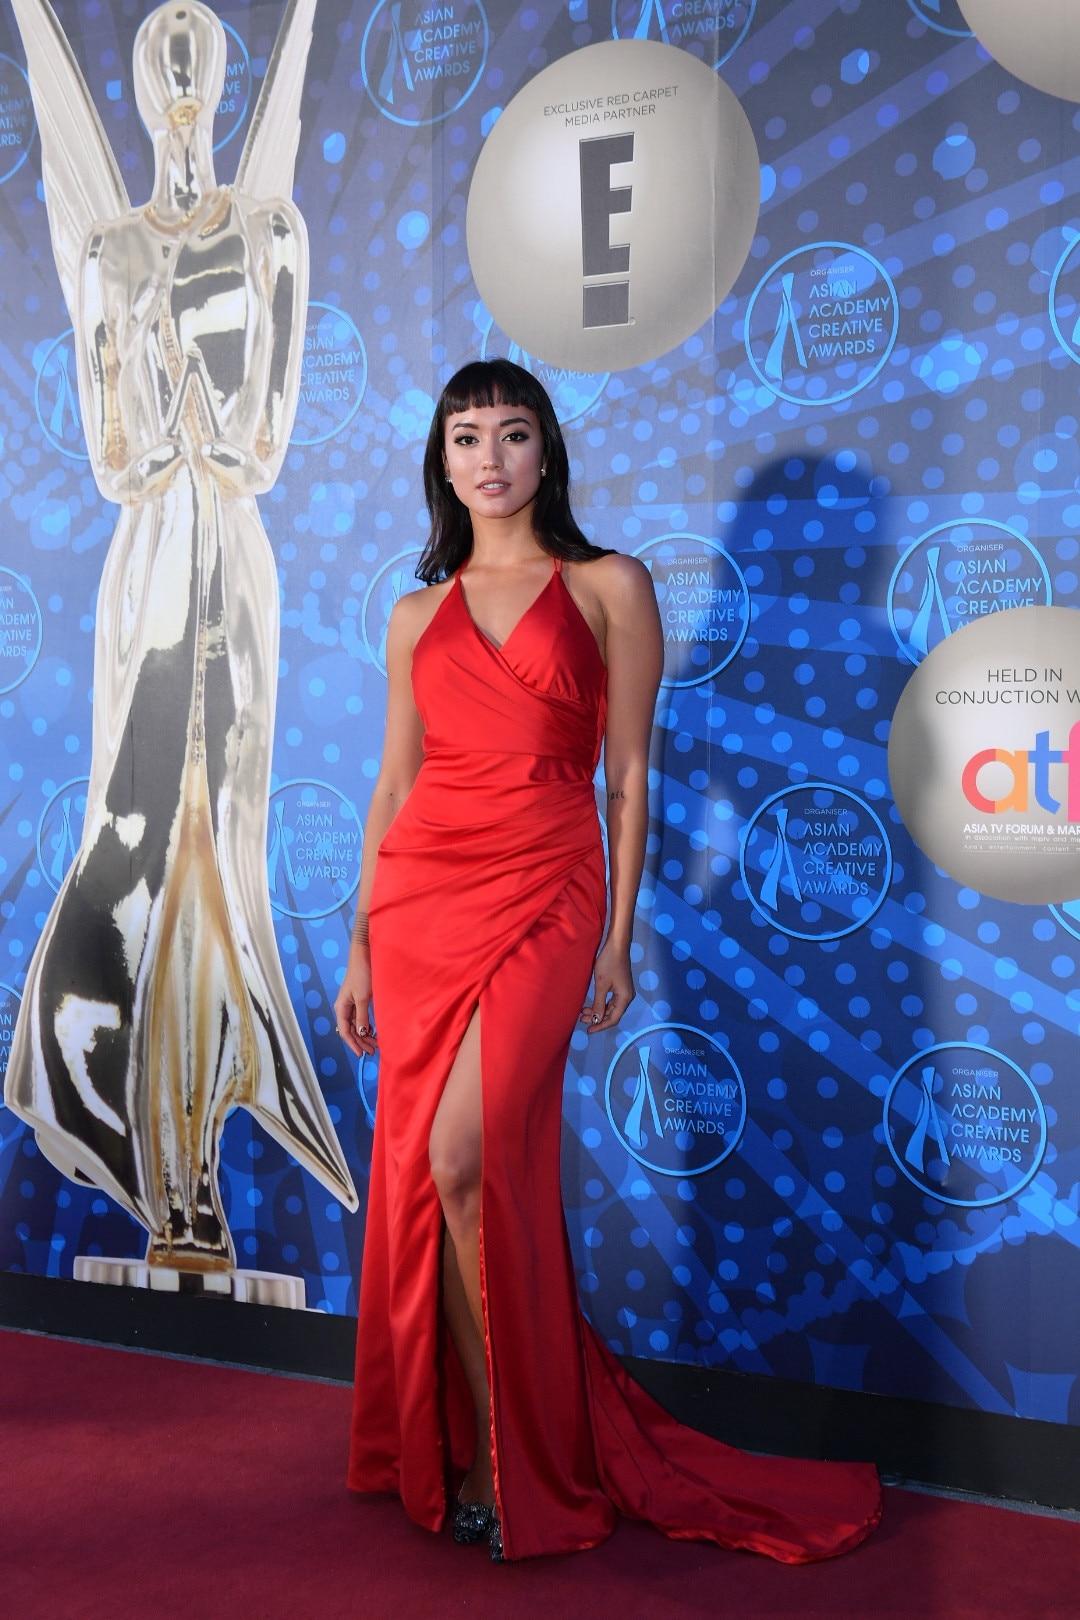 Asian style awards